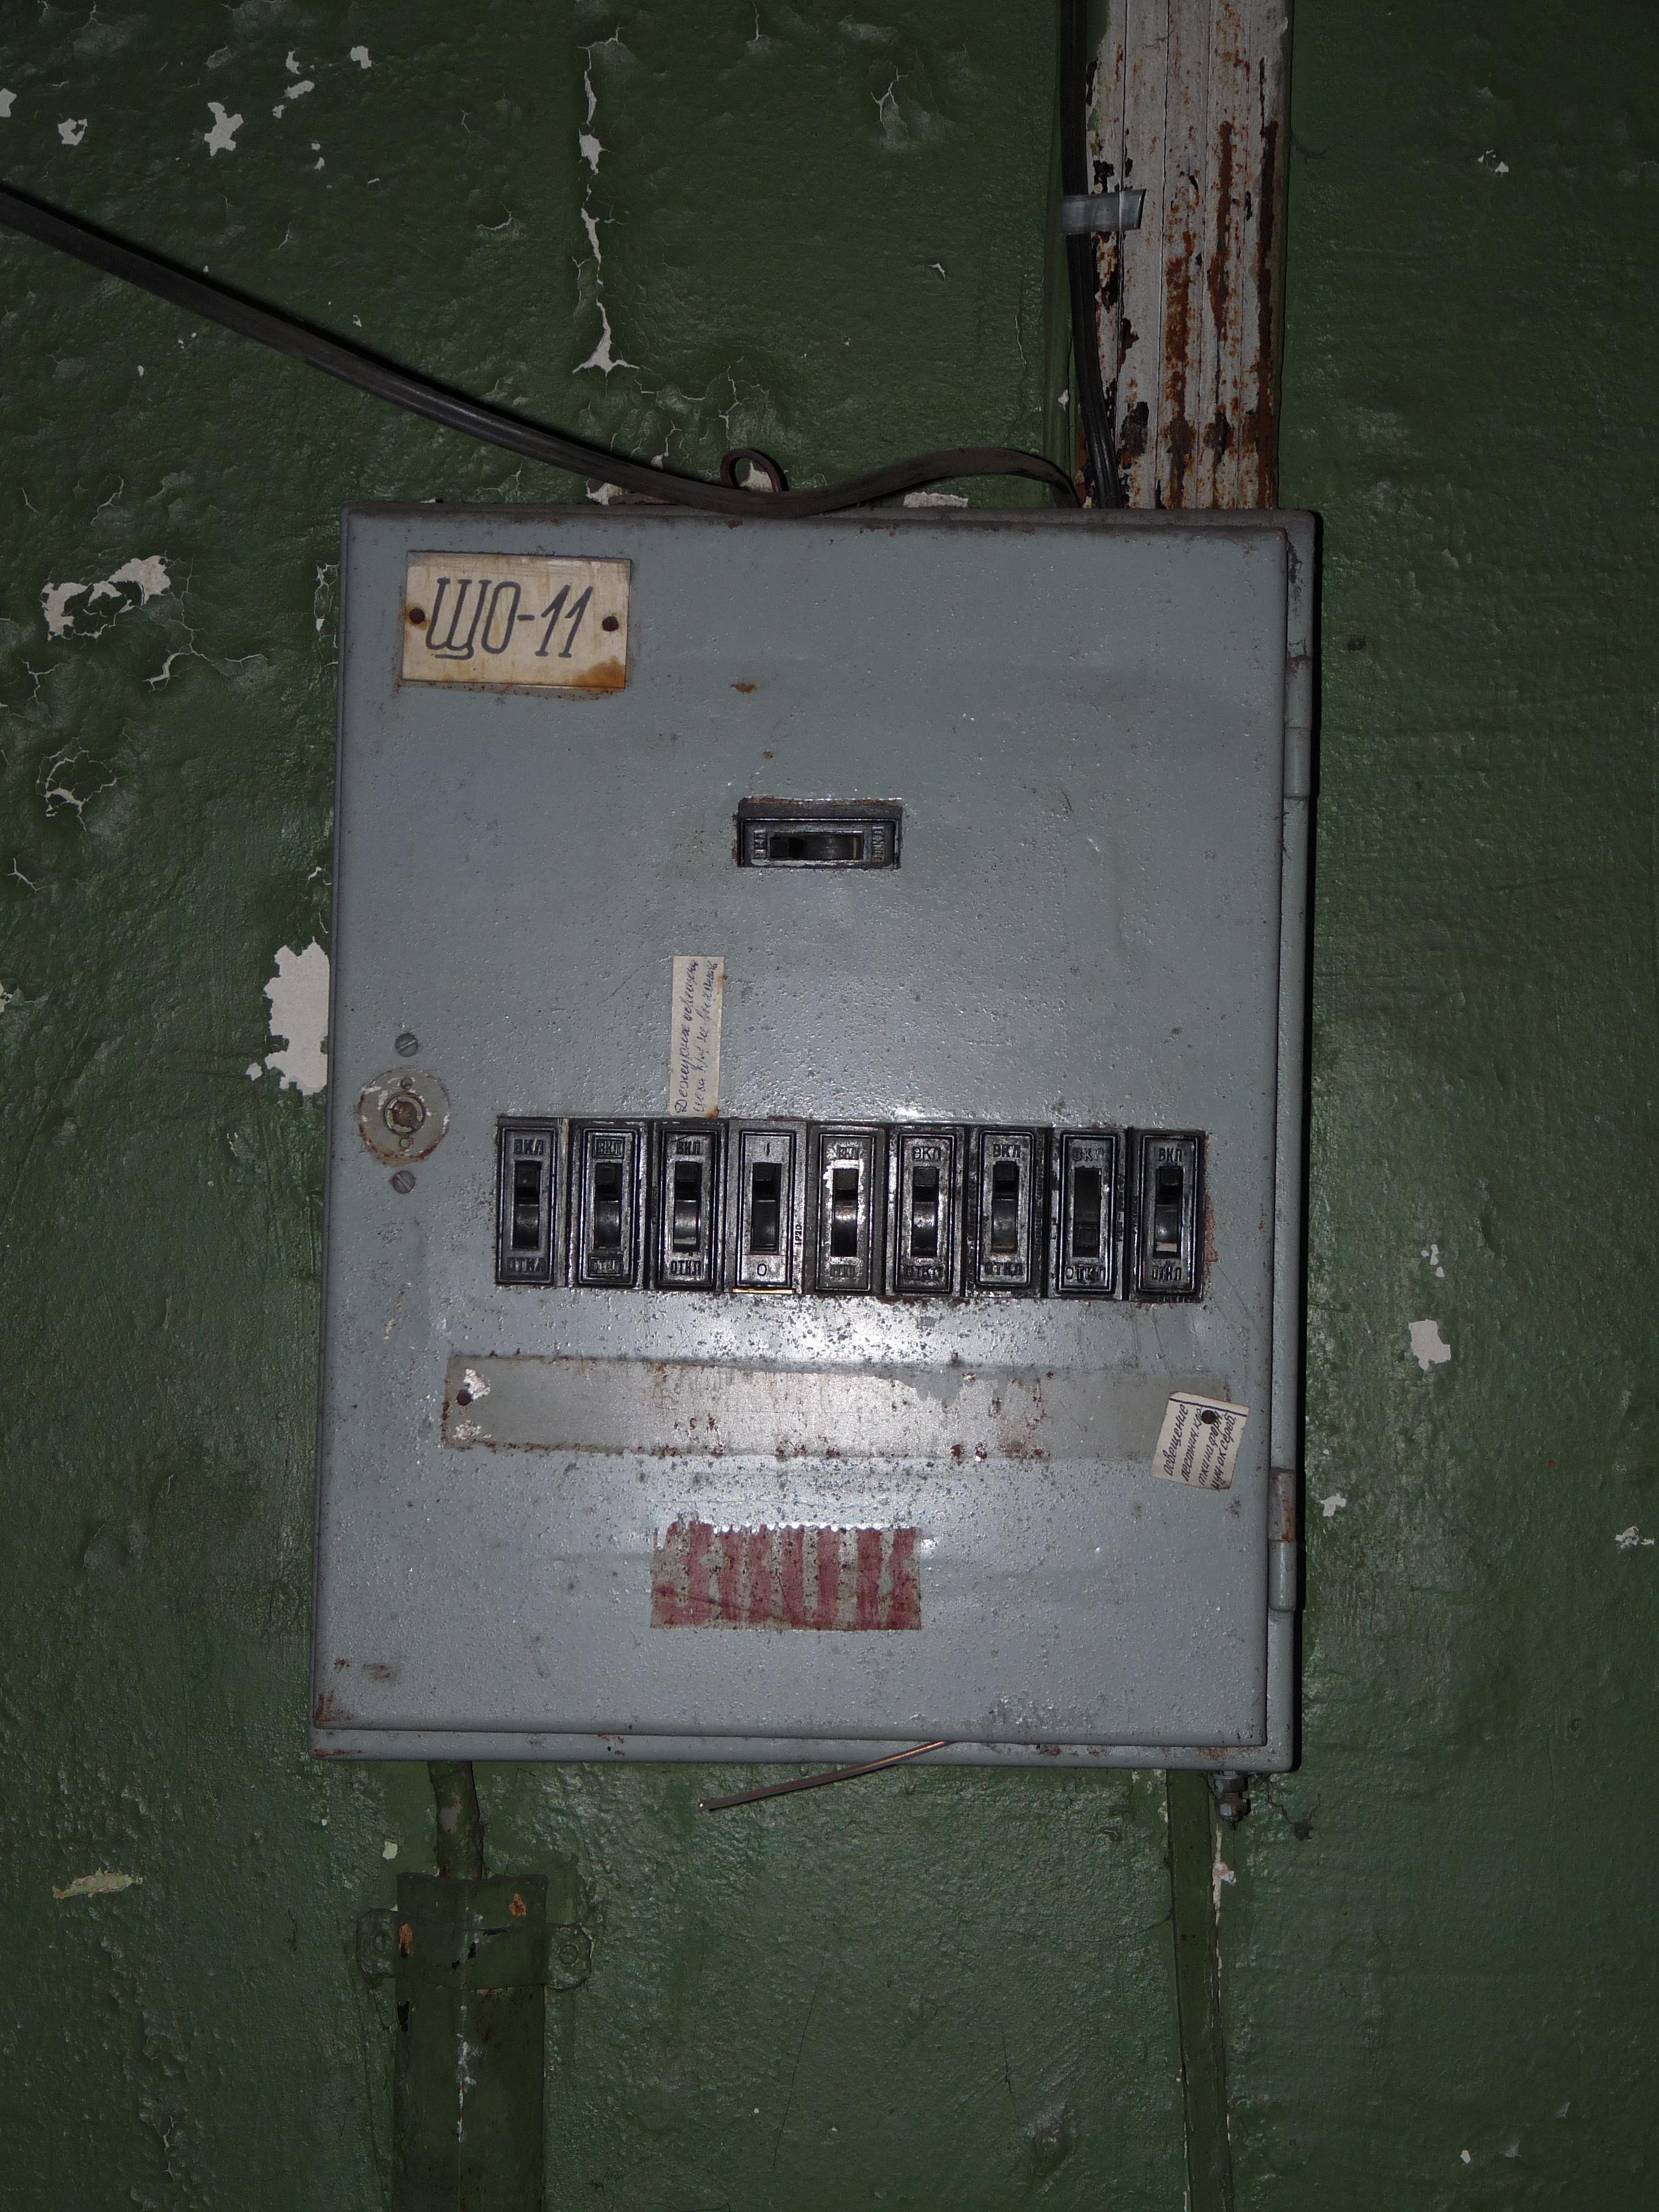 Green Fuse Box Wiring Diagram Pictures 30 Old File Eu Ee Tln Pt Telliskivi Soviet Wikimedia Commons Marine